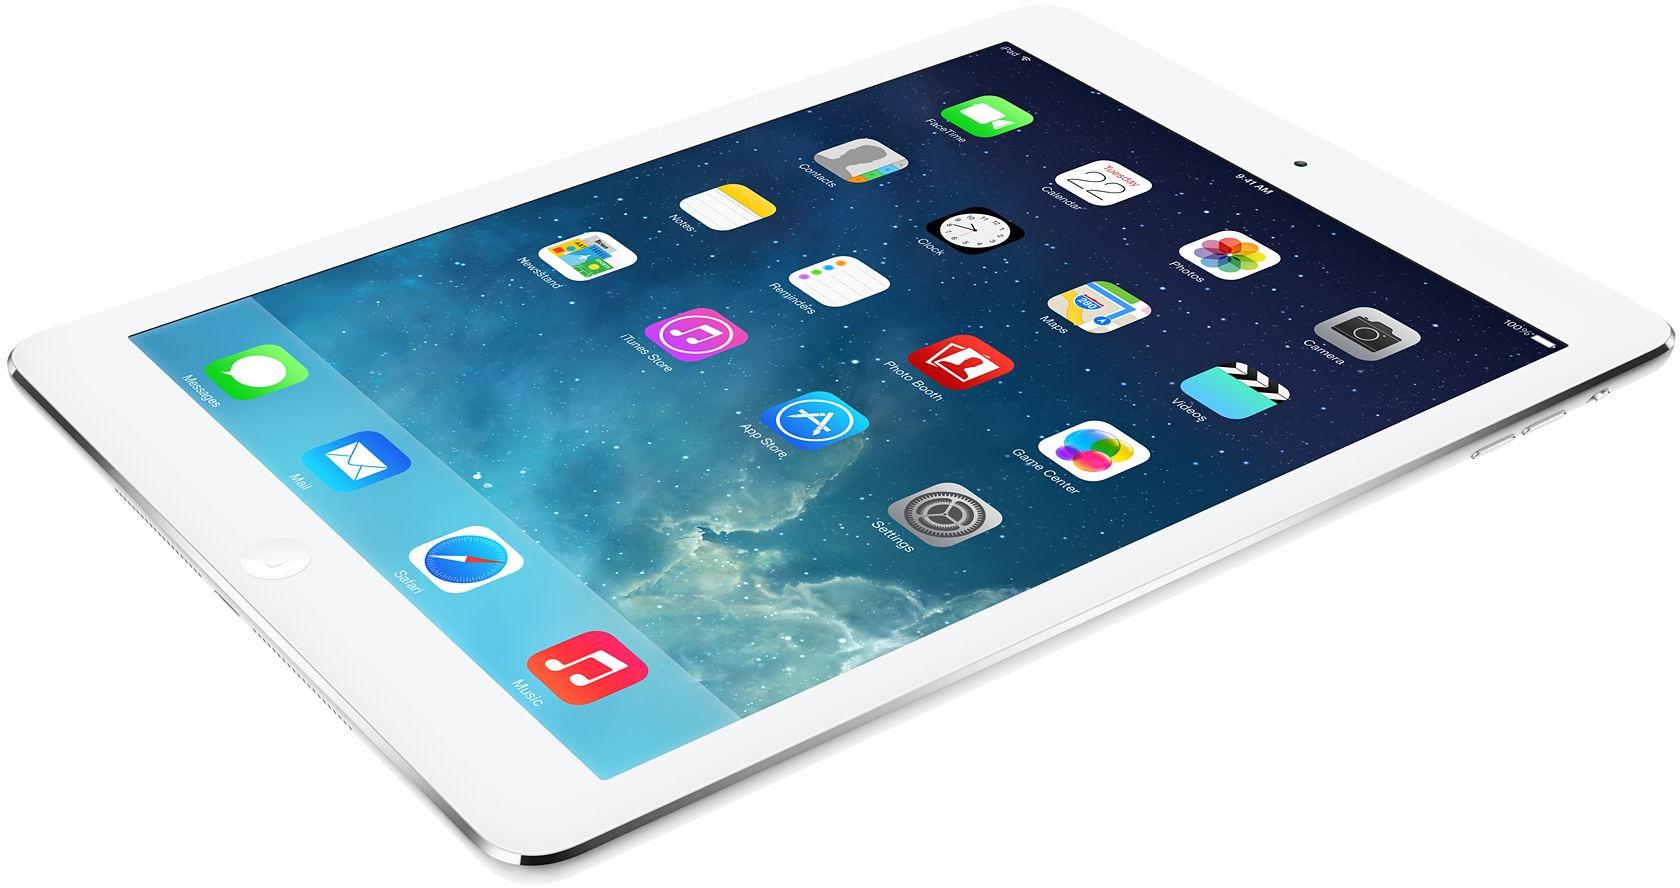 iPad Air deitado